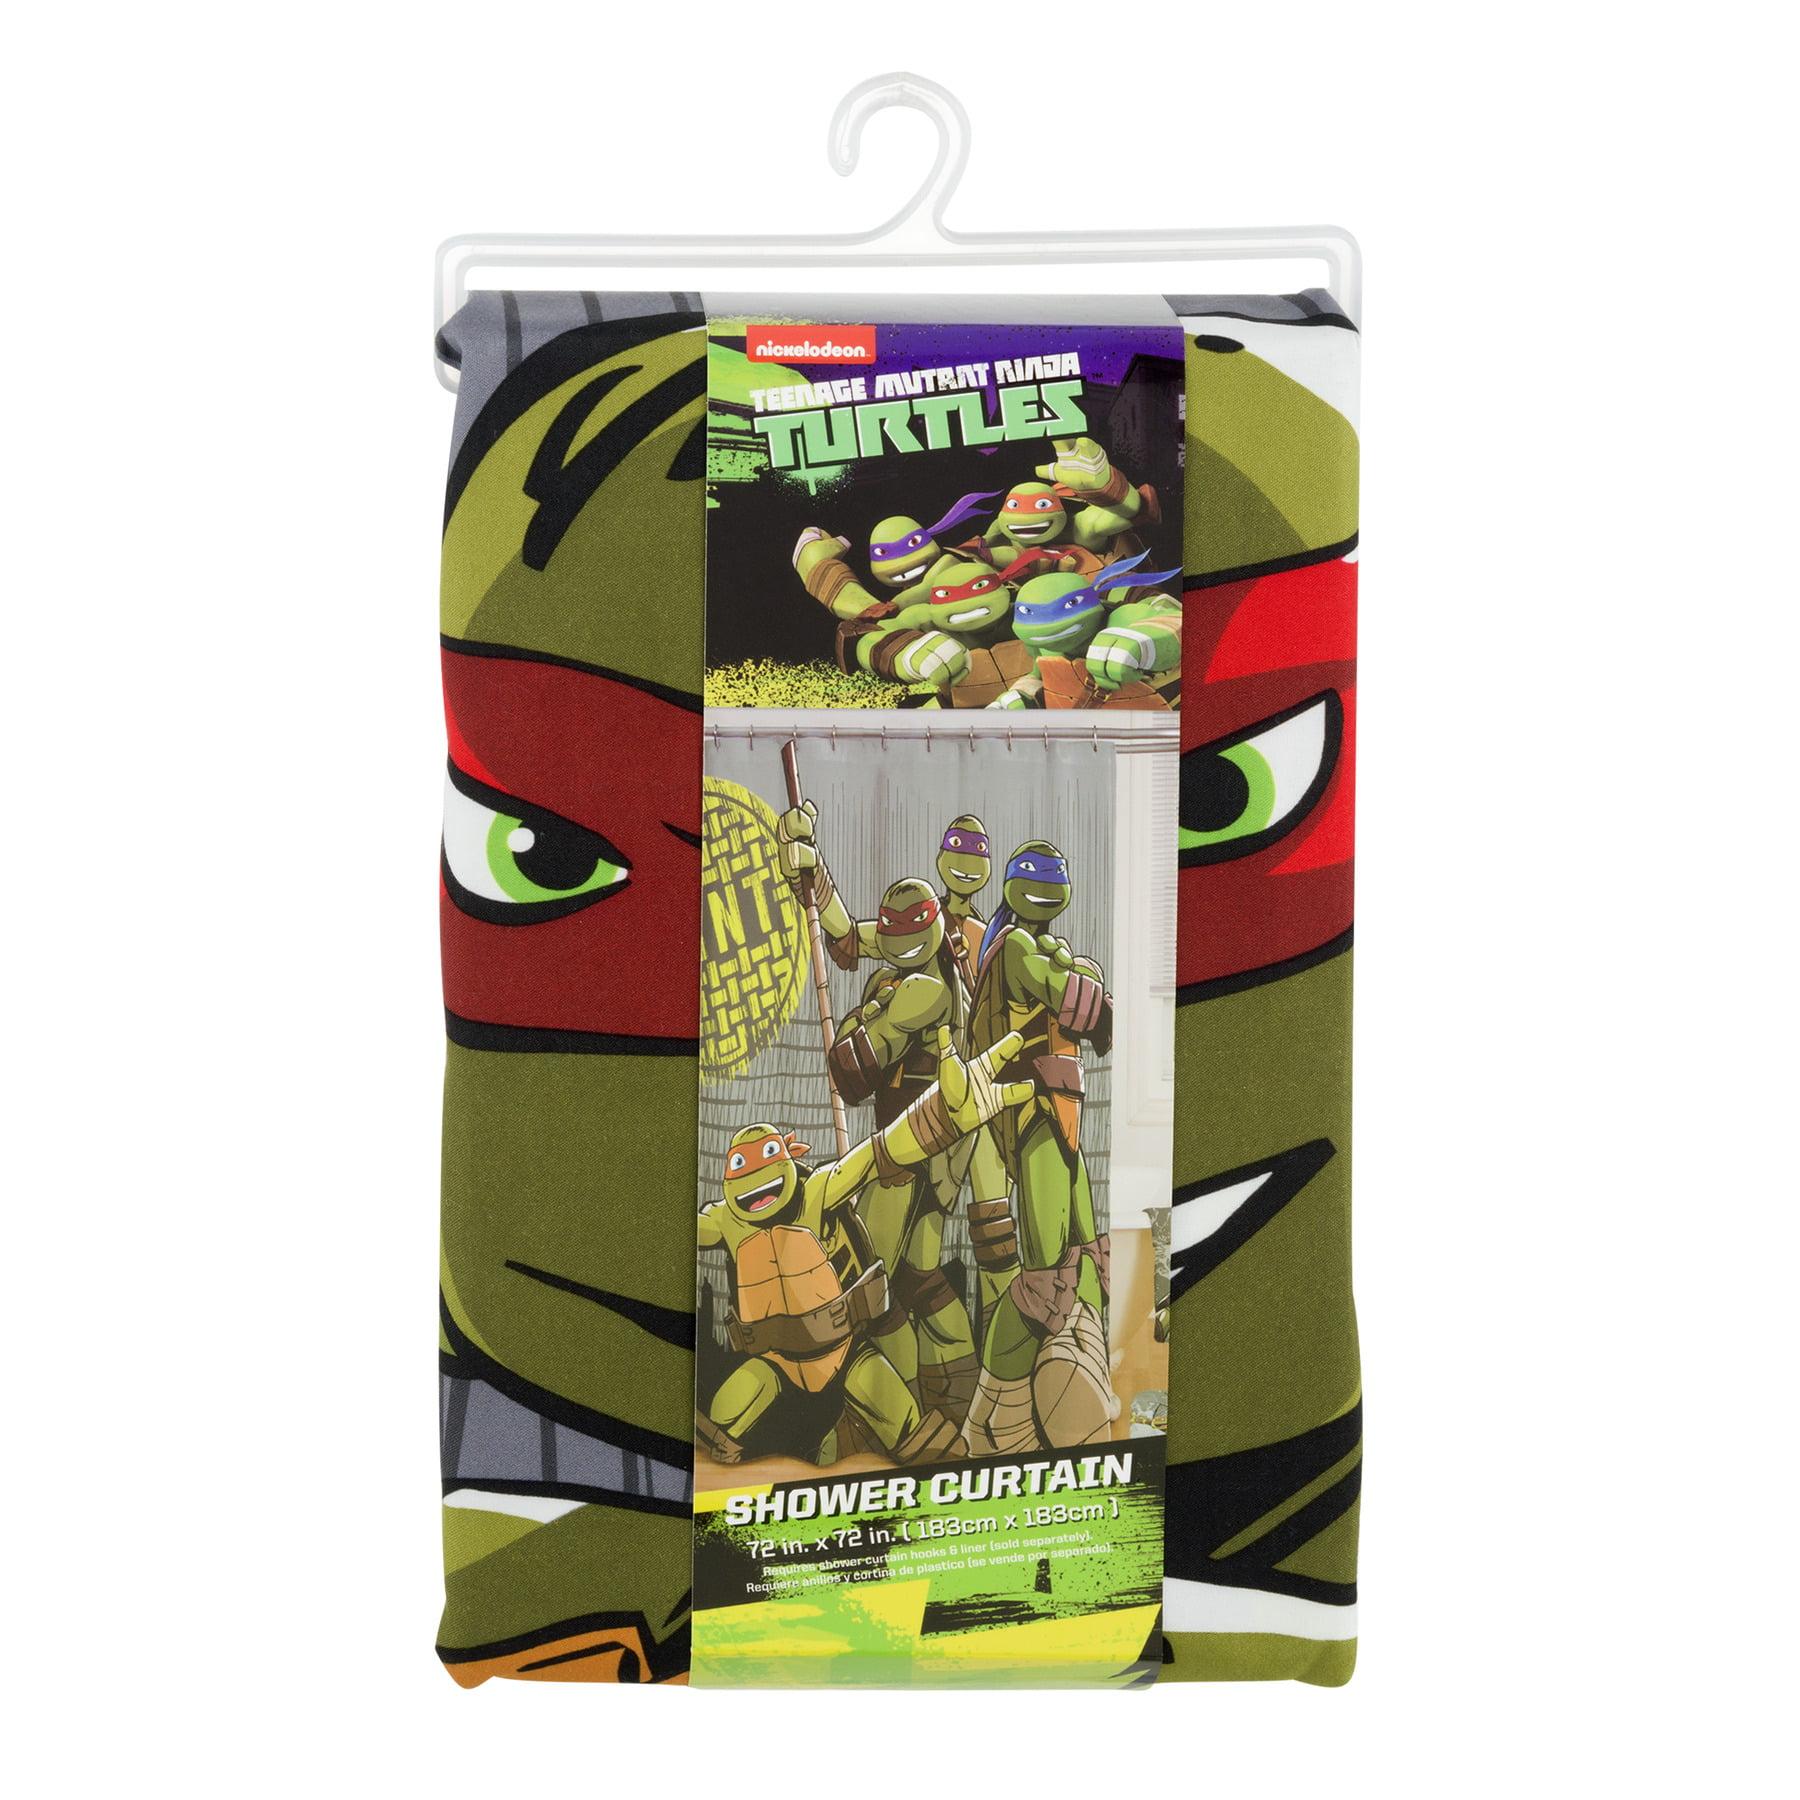 "Nickelodeon Teenage Mutant Ninja Turtles 72"" x 72"" Shower Curtain, 1 Each"